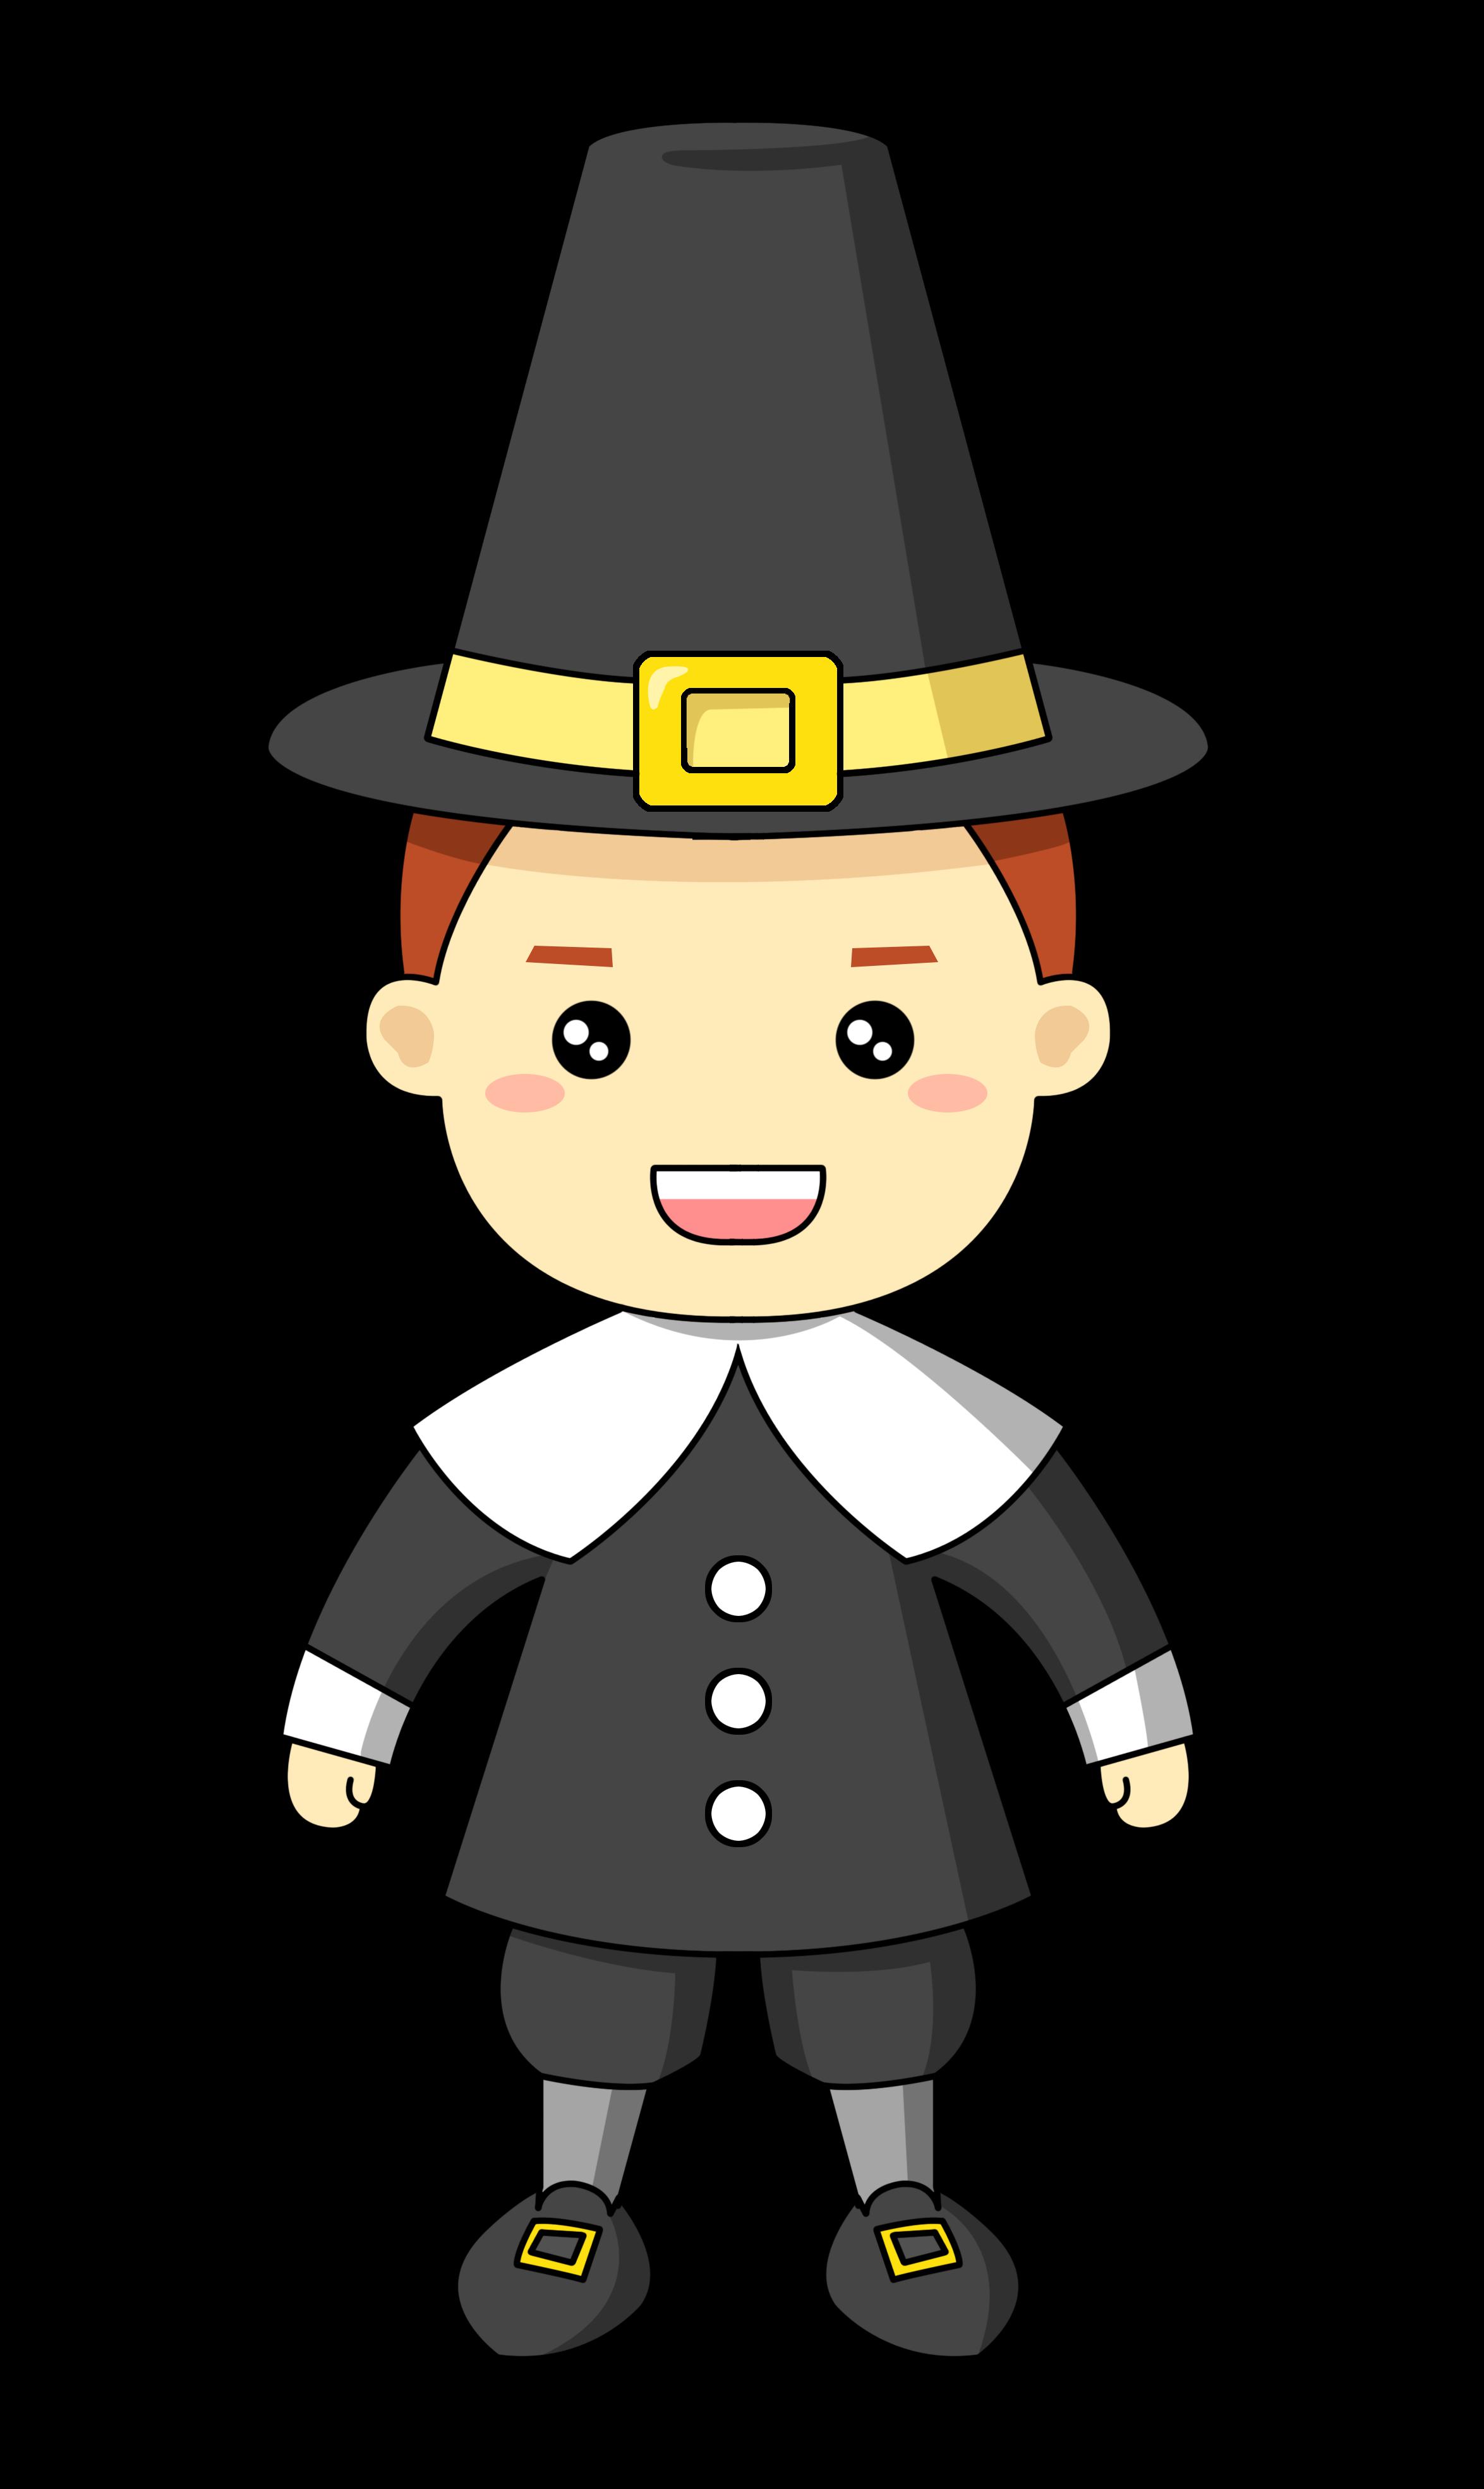 Pilgrim clipart This Thanksgiving use art or